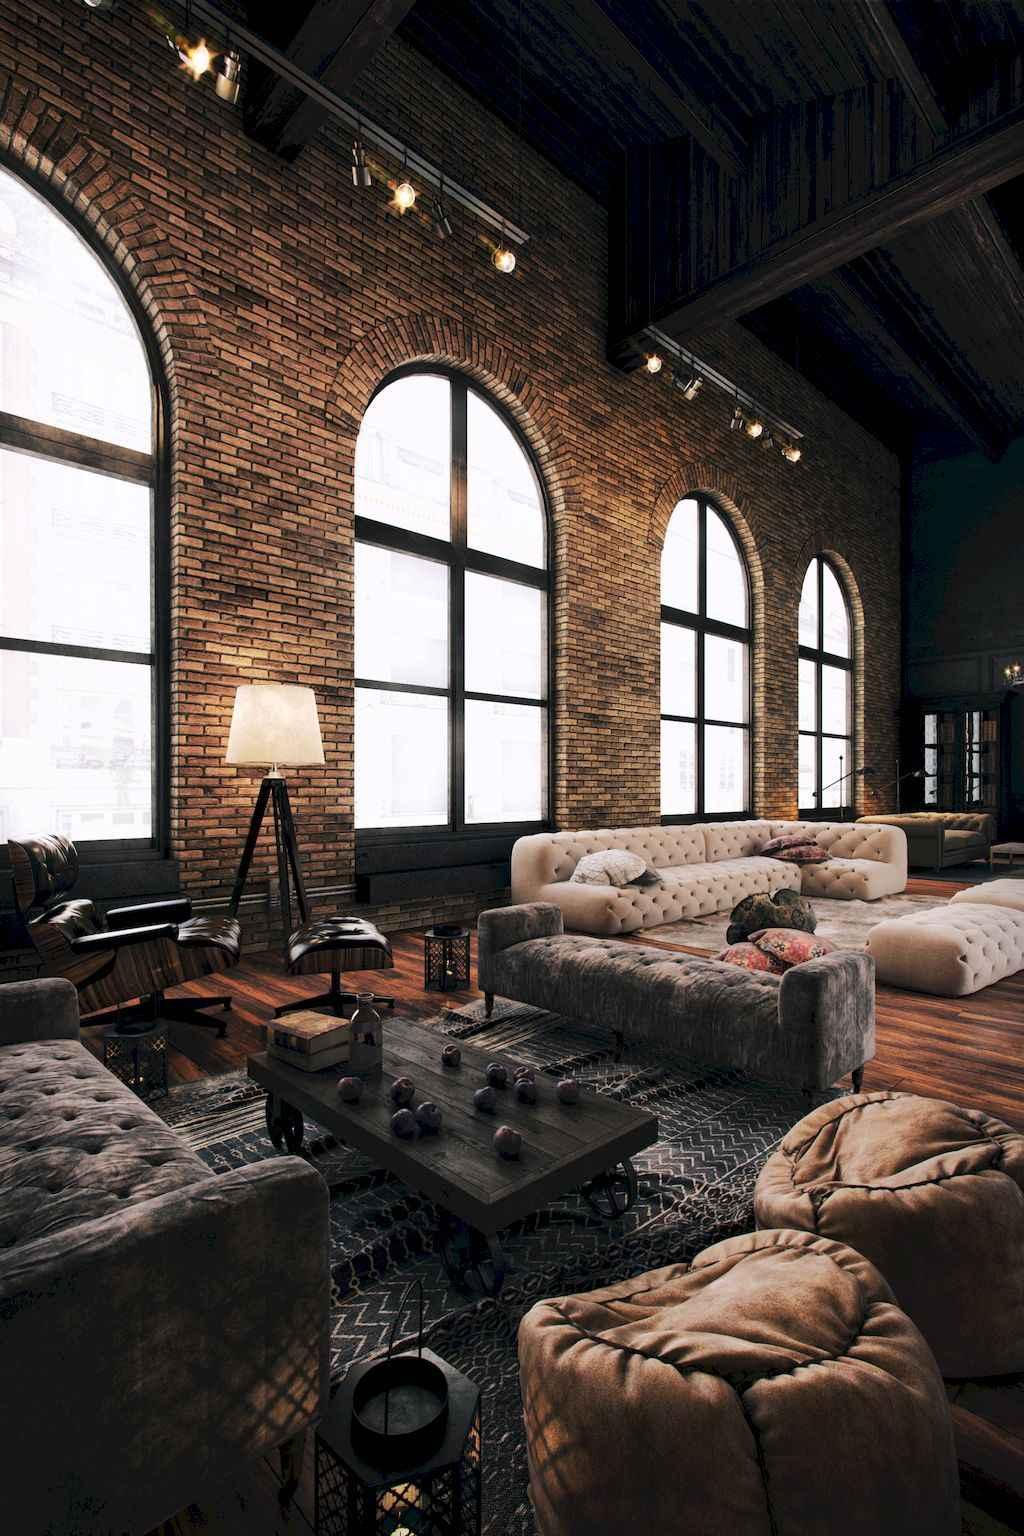 Cool creative loft apartment decorating ideas (21)